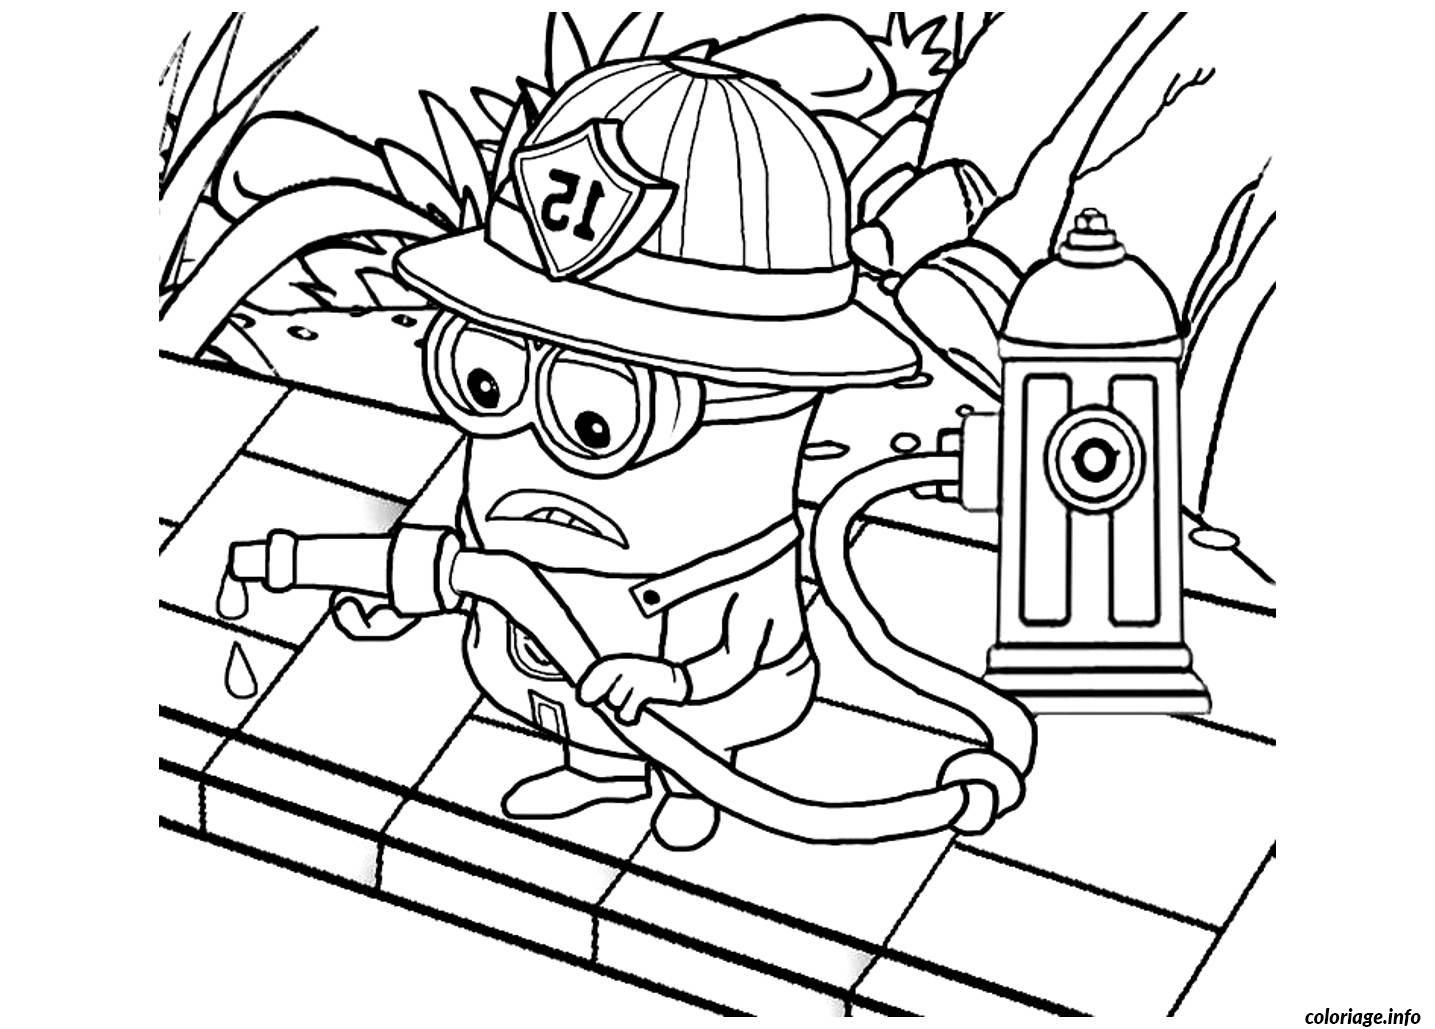 Coloriage Dessin Minion Le Pompier Dessin À Imprimer pour Coloriage Pompier A Imprimer Gratuit